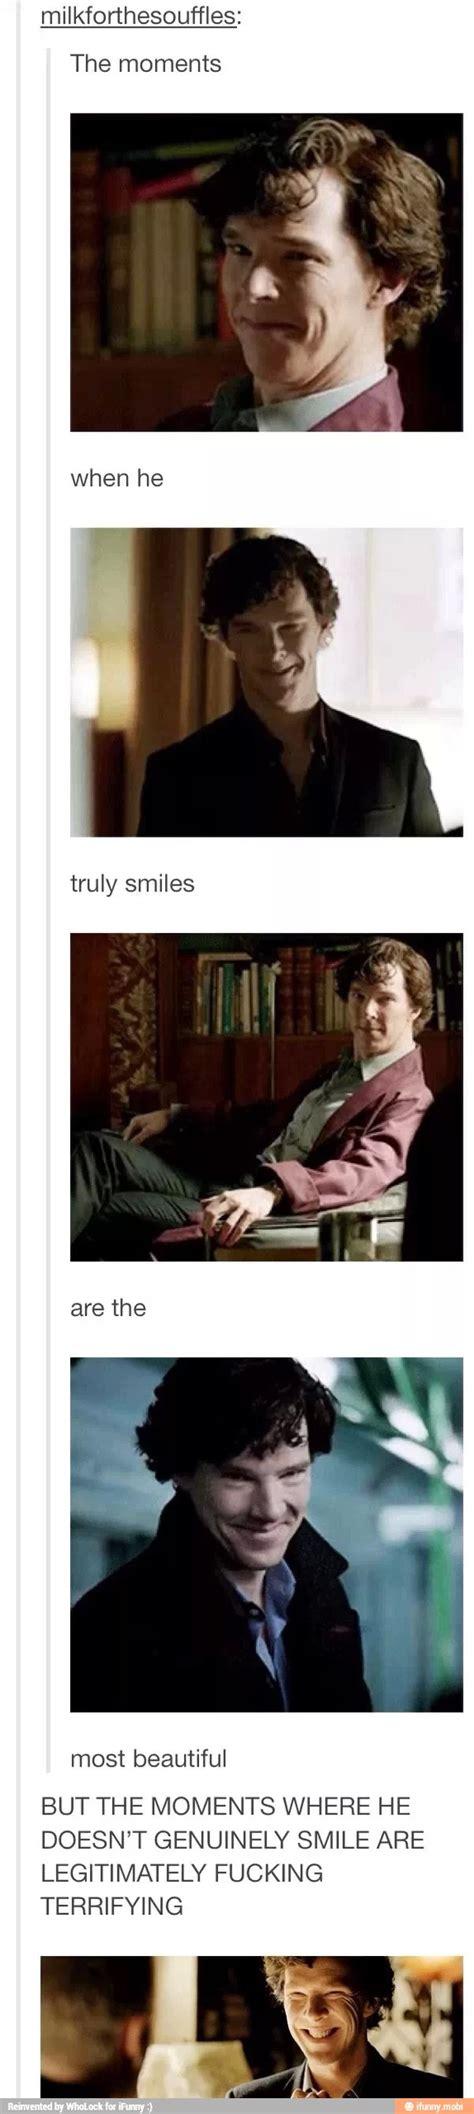 sherlock bbc smiling benedict cumberbatch holmes smile fandom